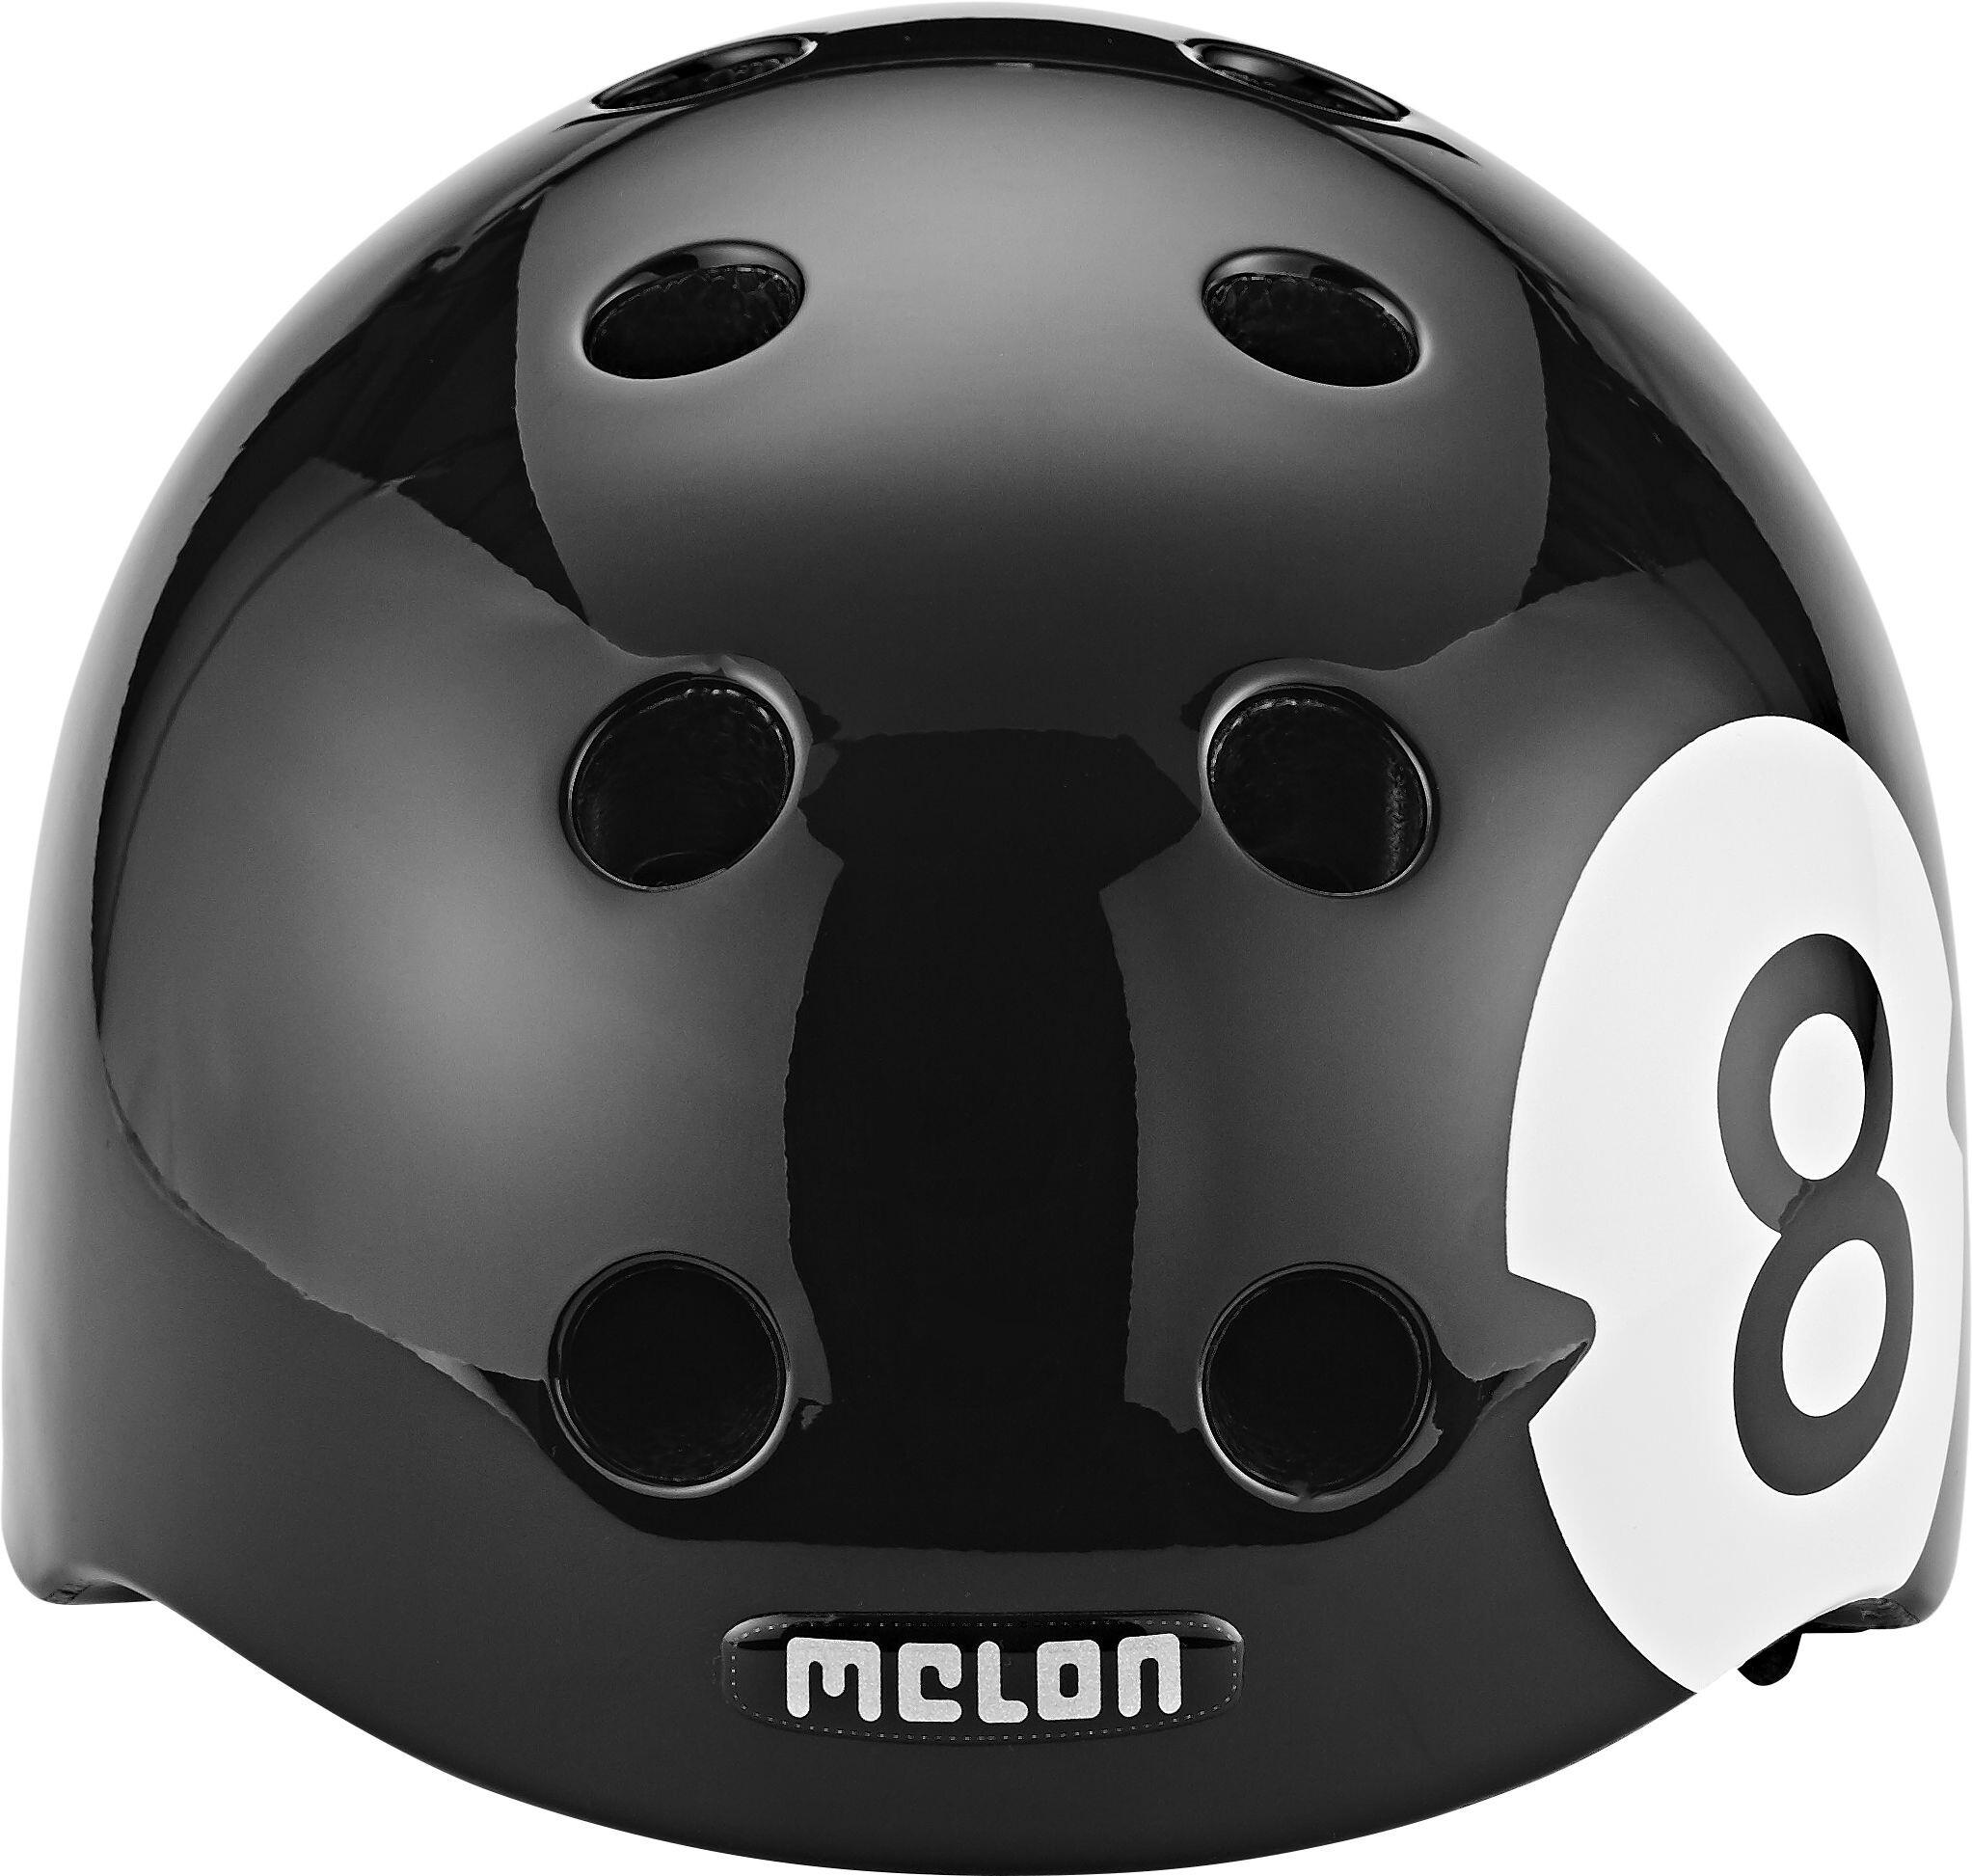 melon urban active story bike helmet 8 ball black at. Black Bedroom Furniture Sets. Home Design Ideas